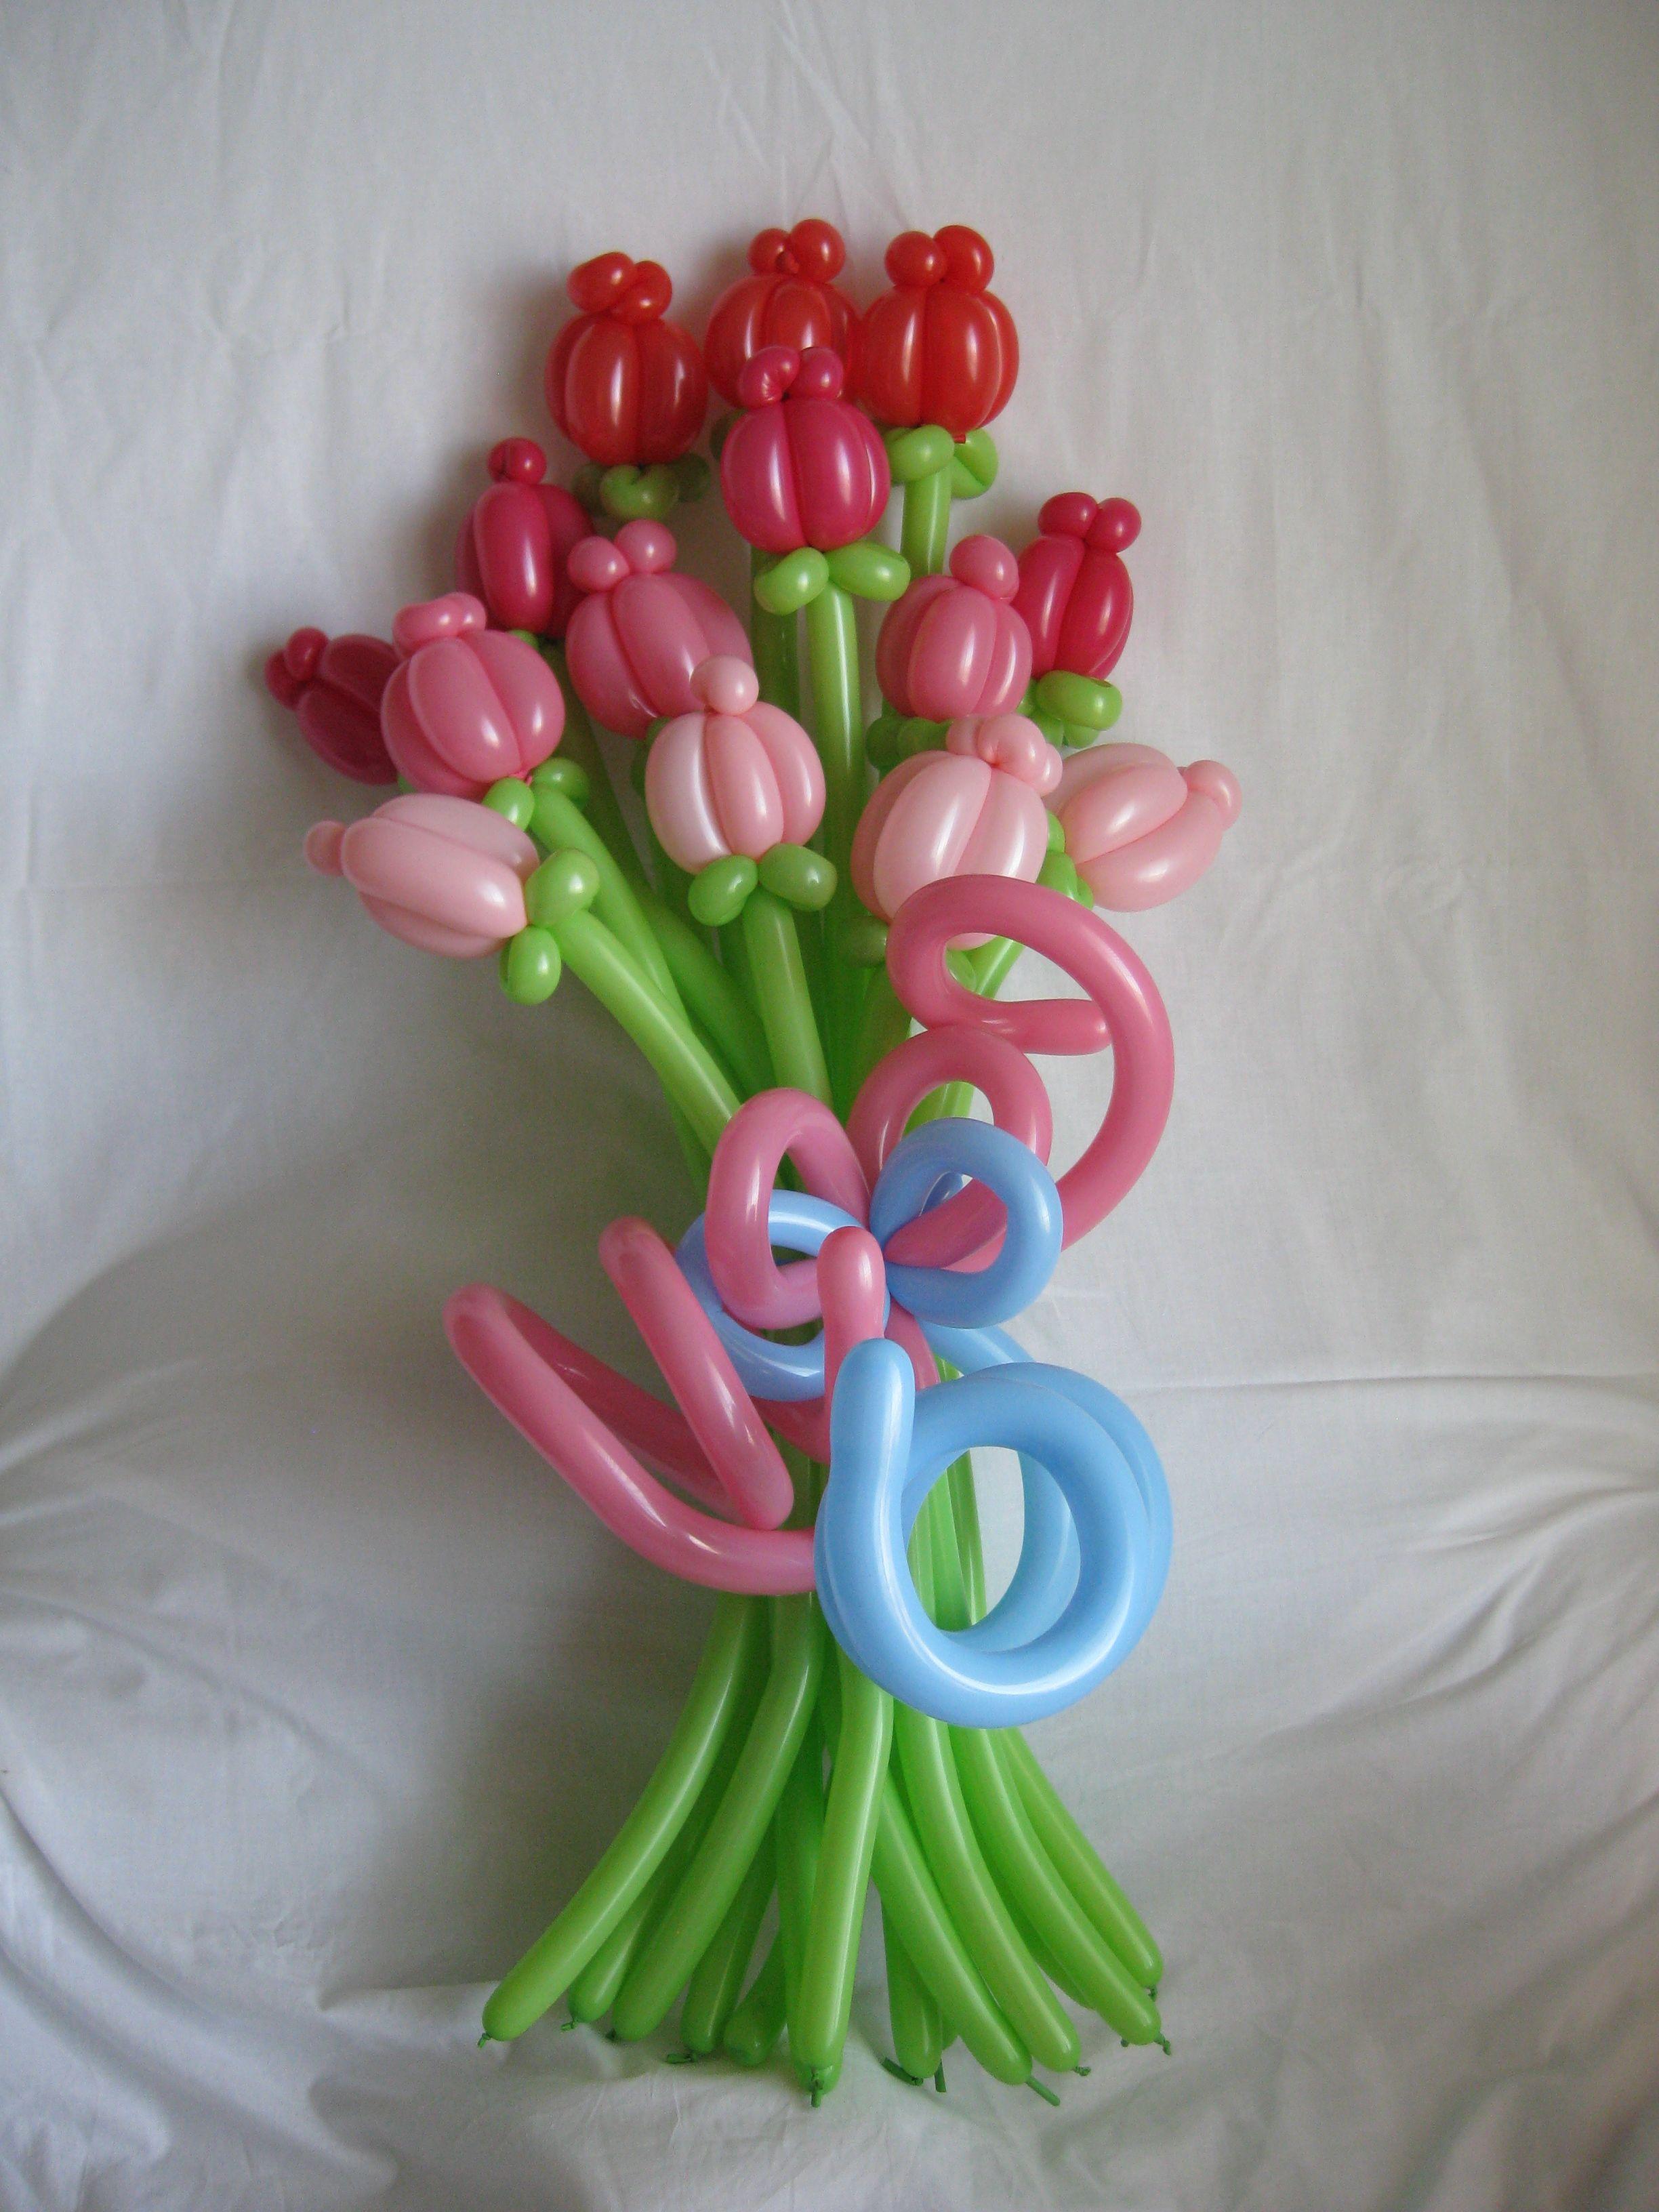 Clown A Riffic Birthday Party Pinterest Balloon Flowers